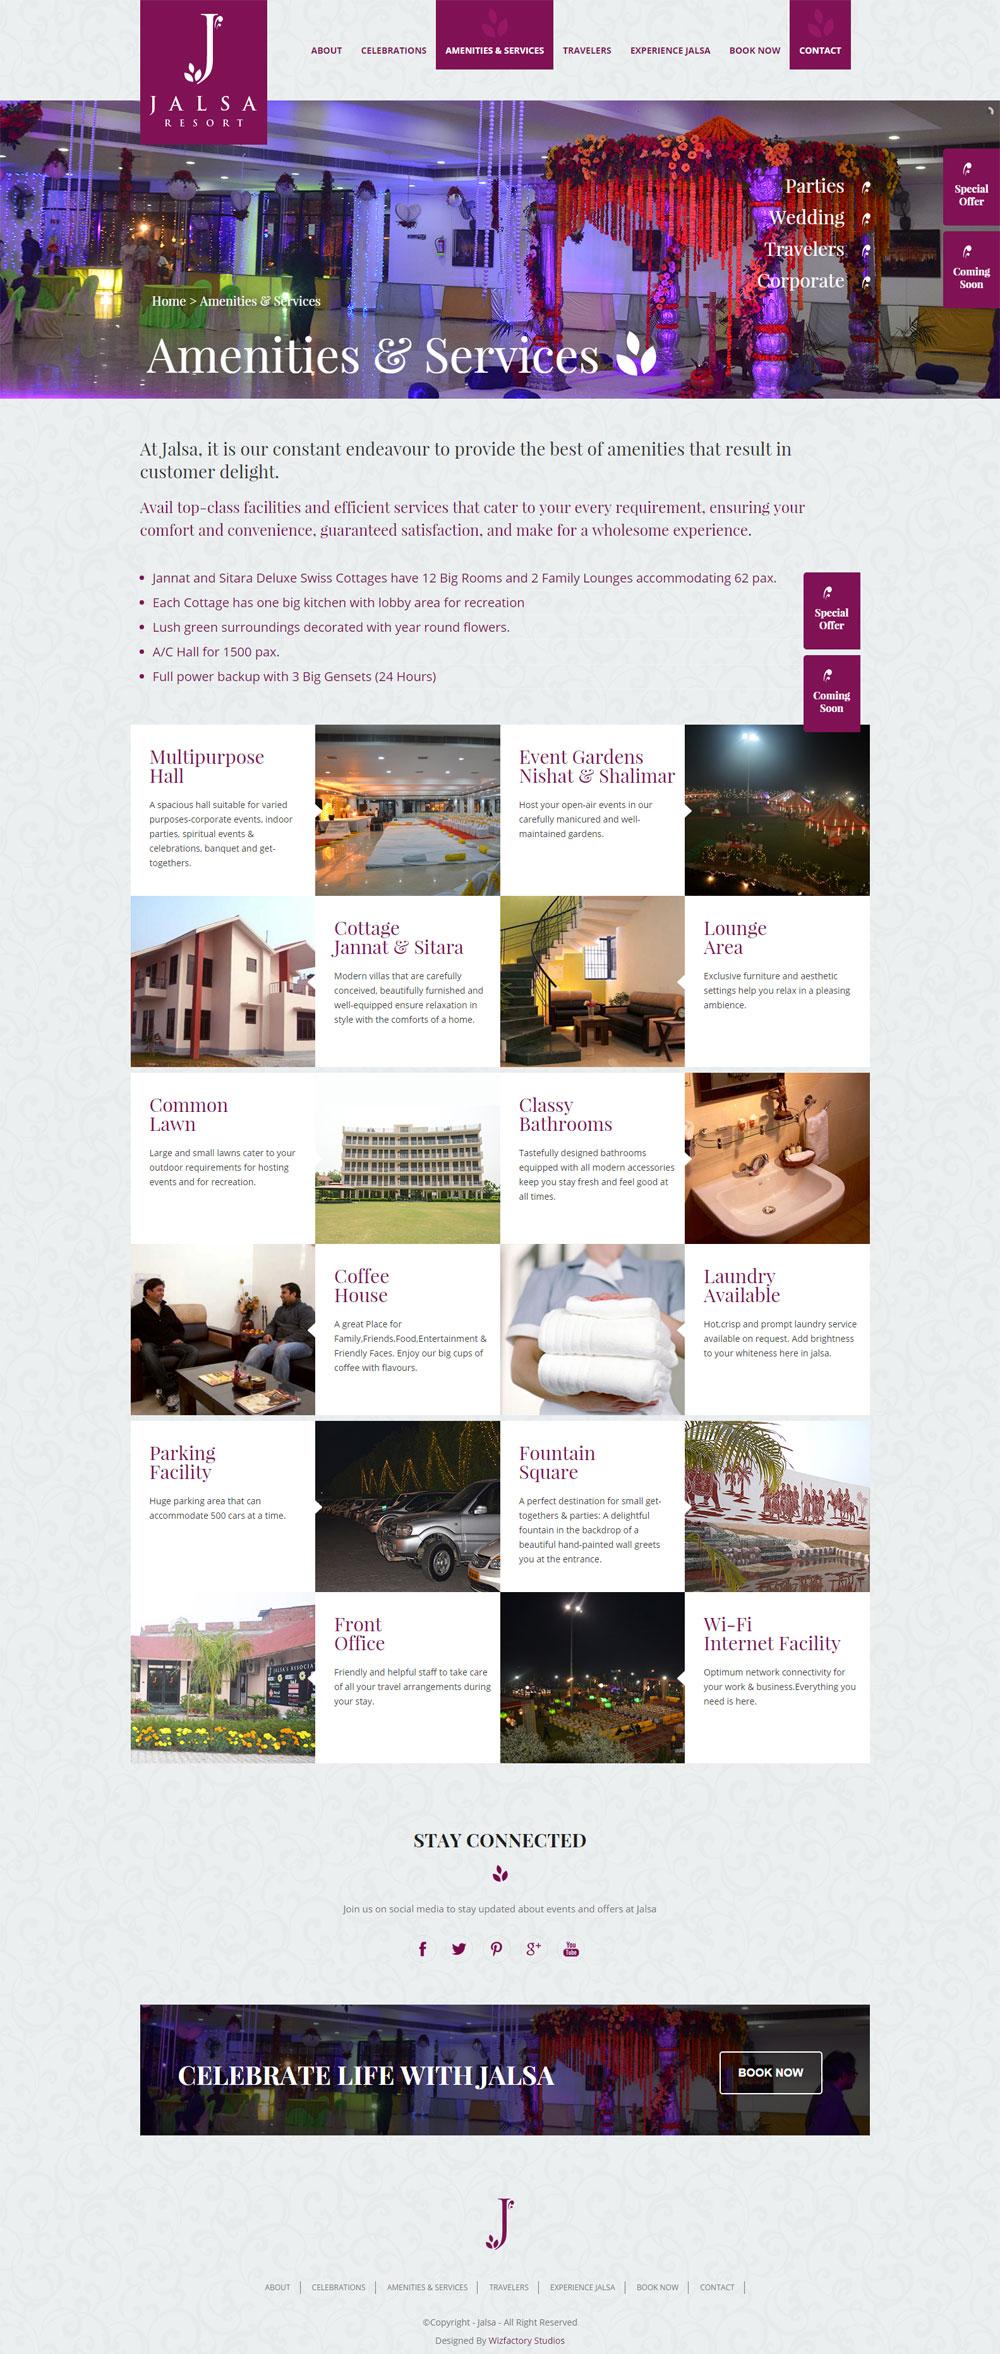 Amenities-Services_Jalsa-Resorts